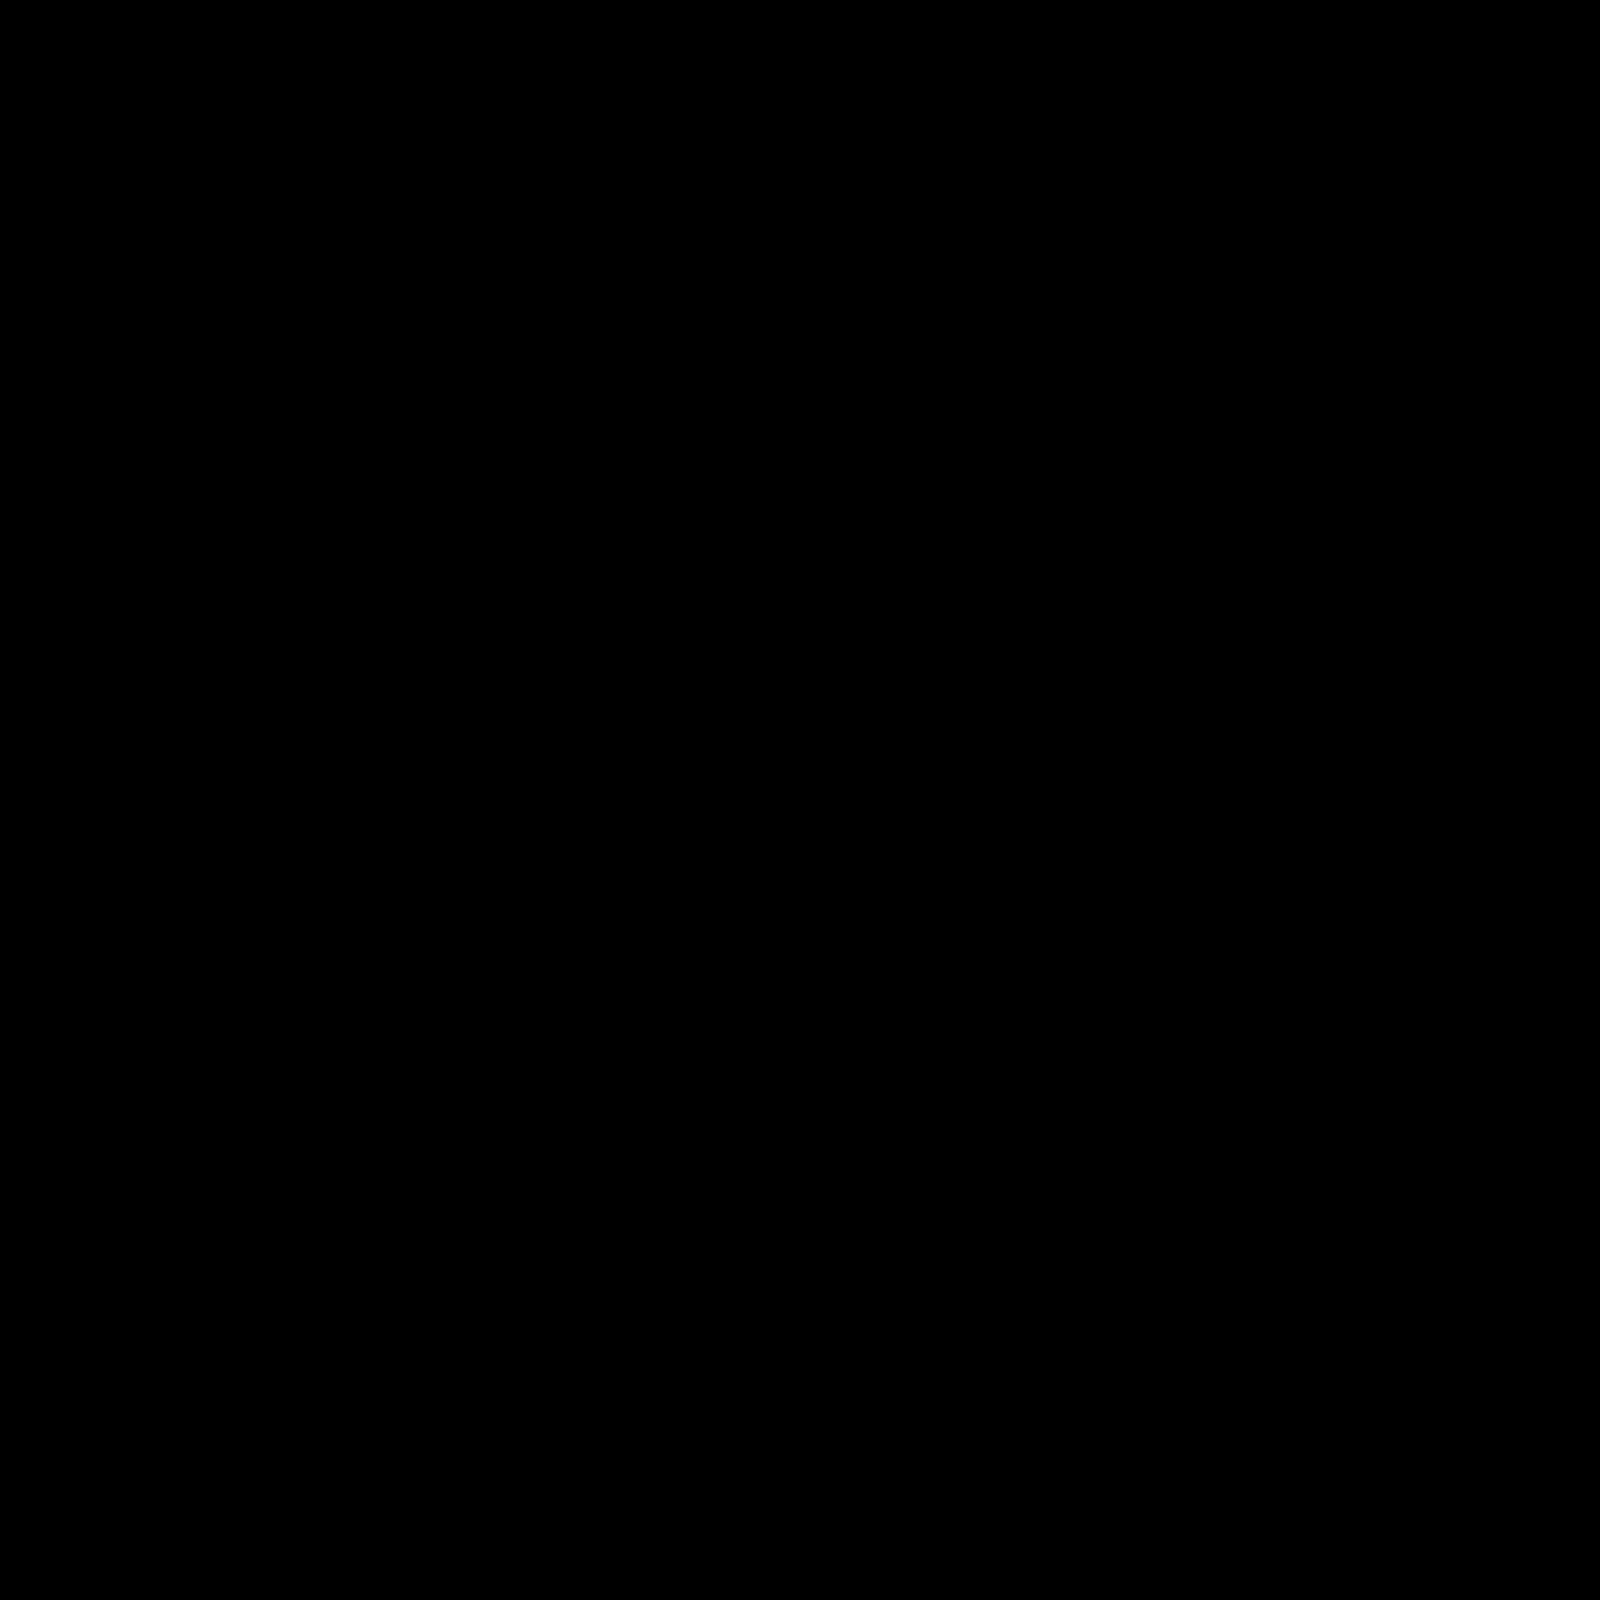 Búho icon